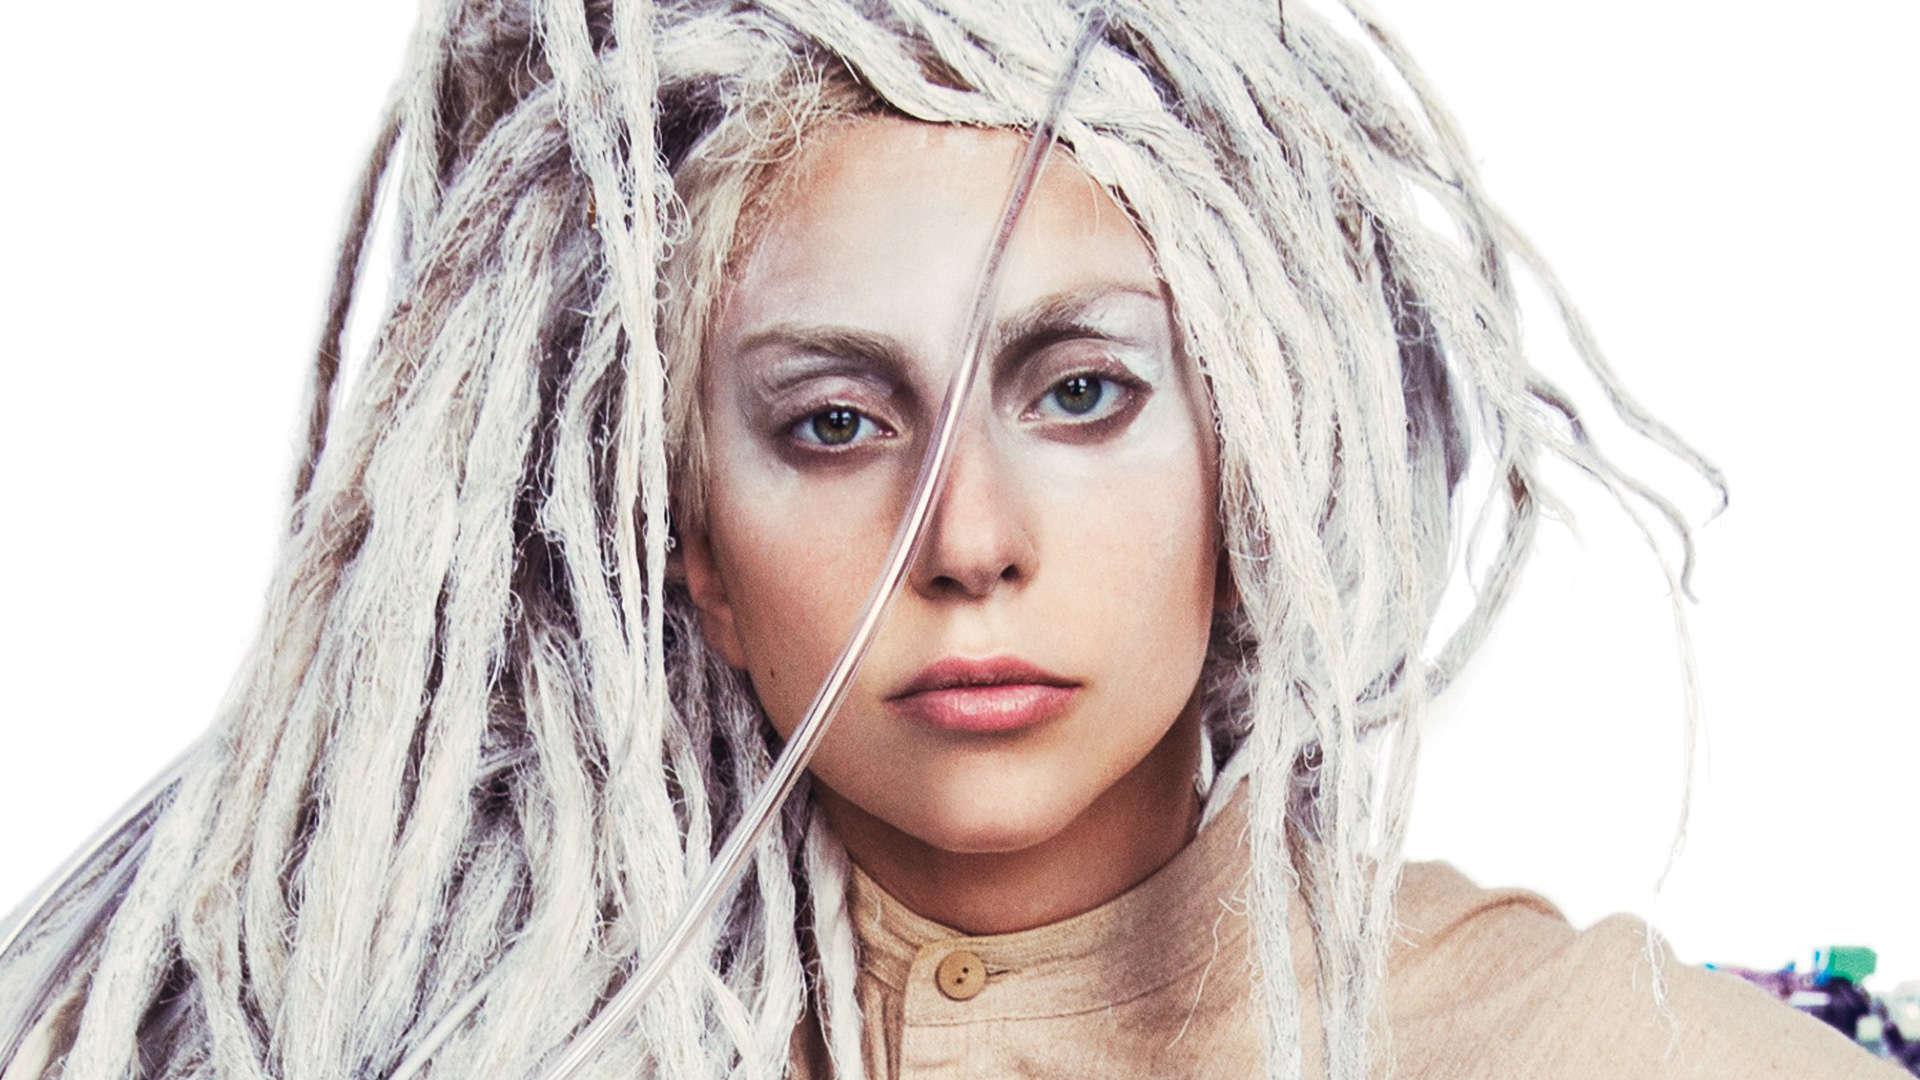 Beautiful Lady Gaga Photos | Beautiful images HD Pictures & Desktop ...